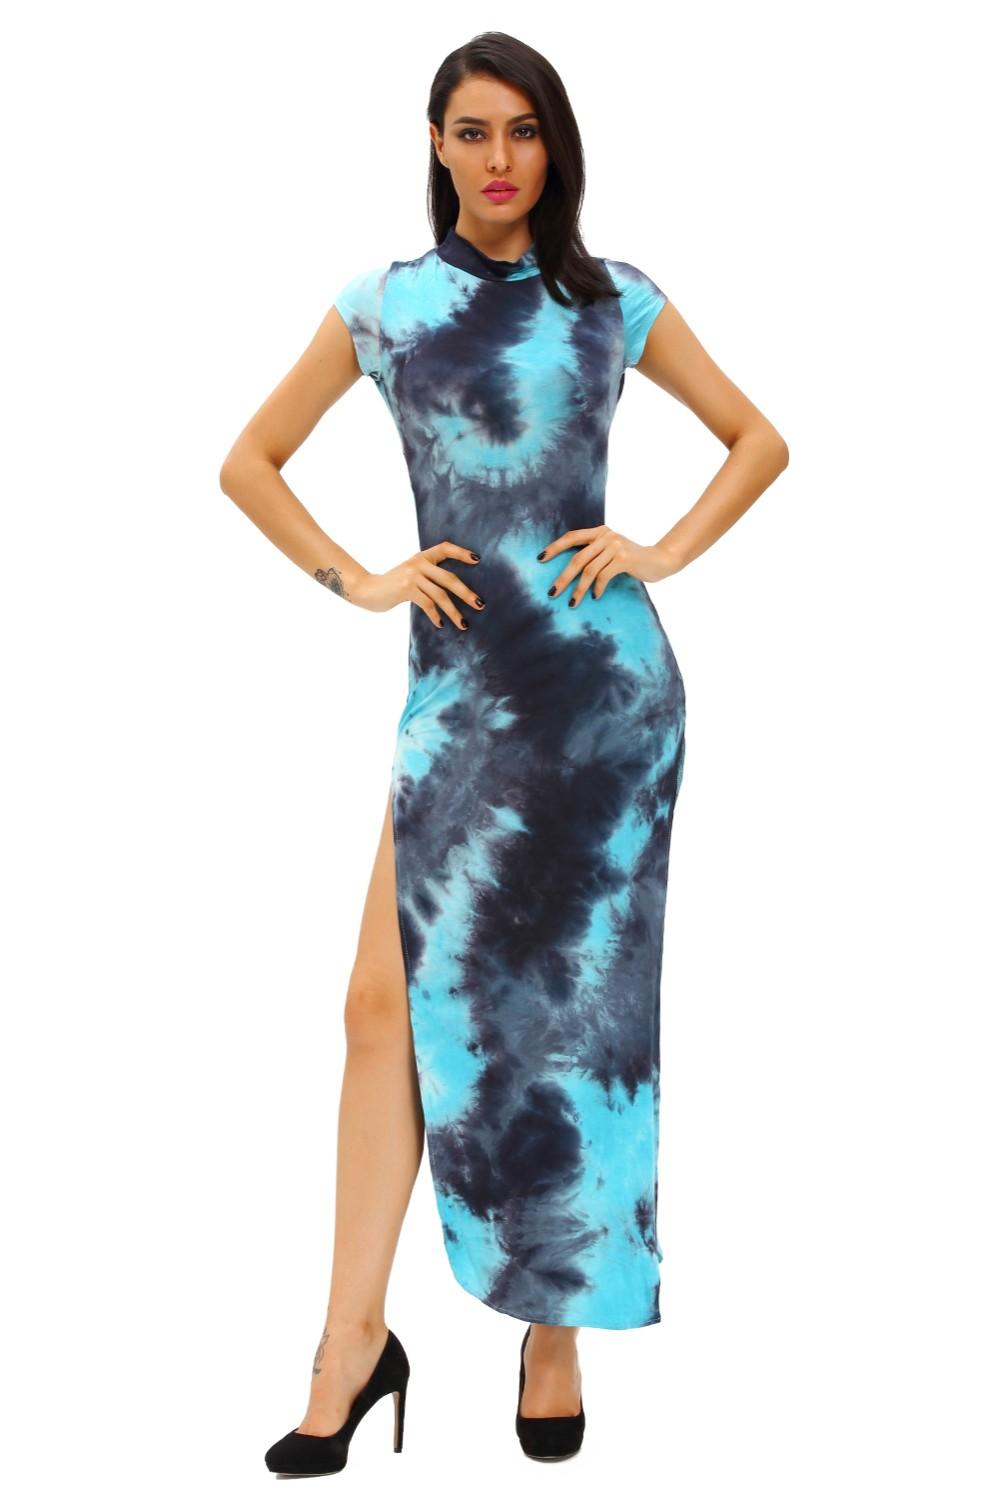 Bluish-Tie-Dye-Vintage-Short-Sleeve-Cheongsam-Dress-LC60955-4-5